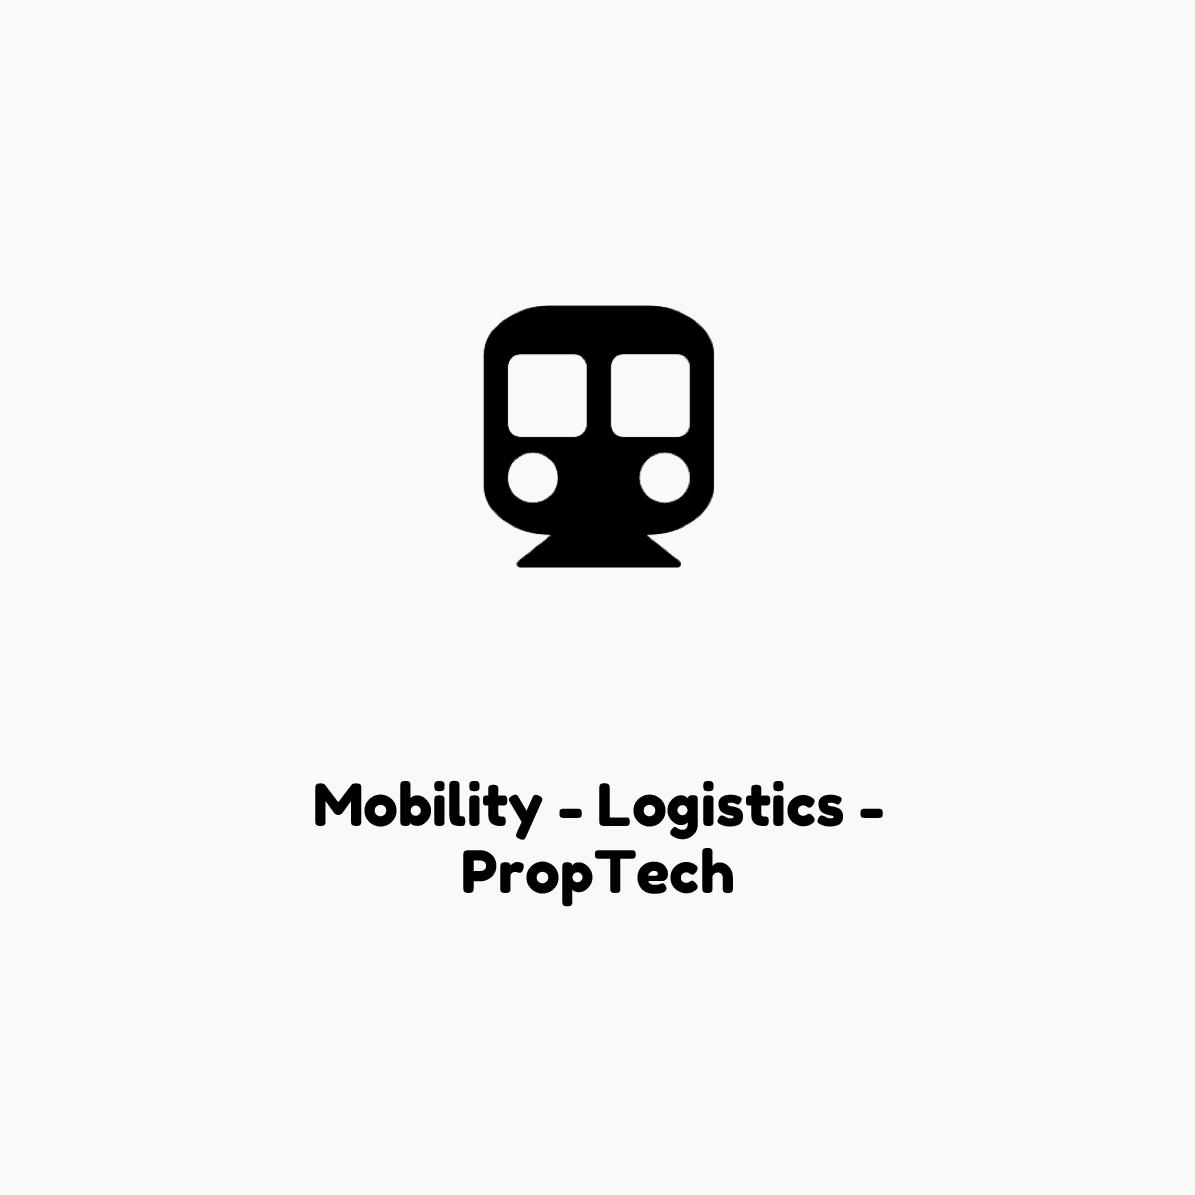 Mobility Logistics PropTech